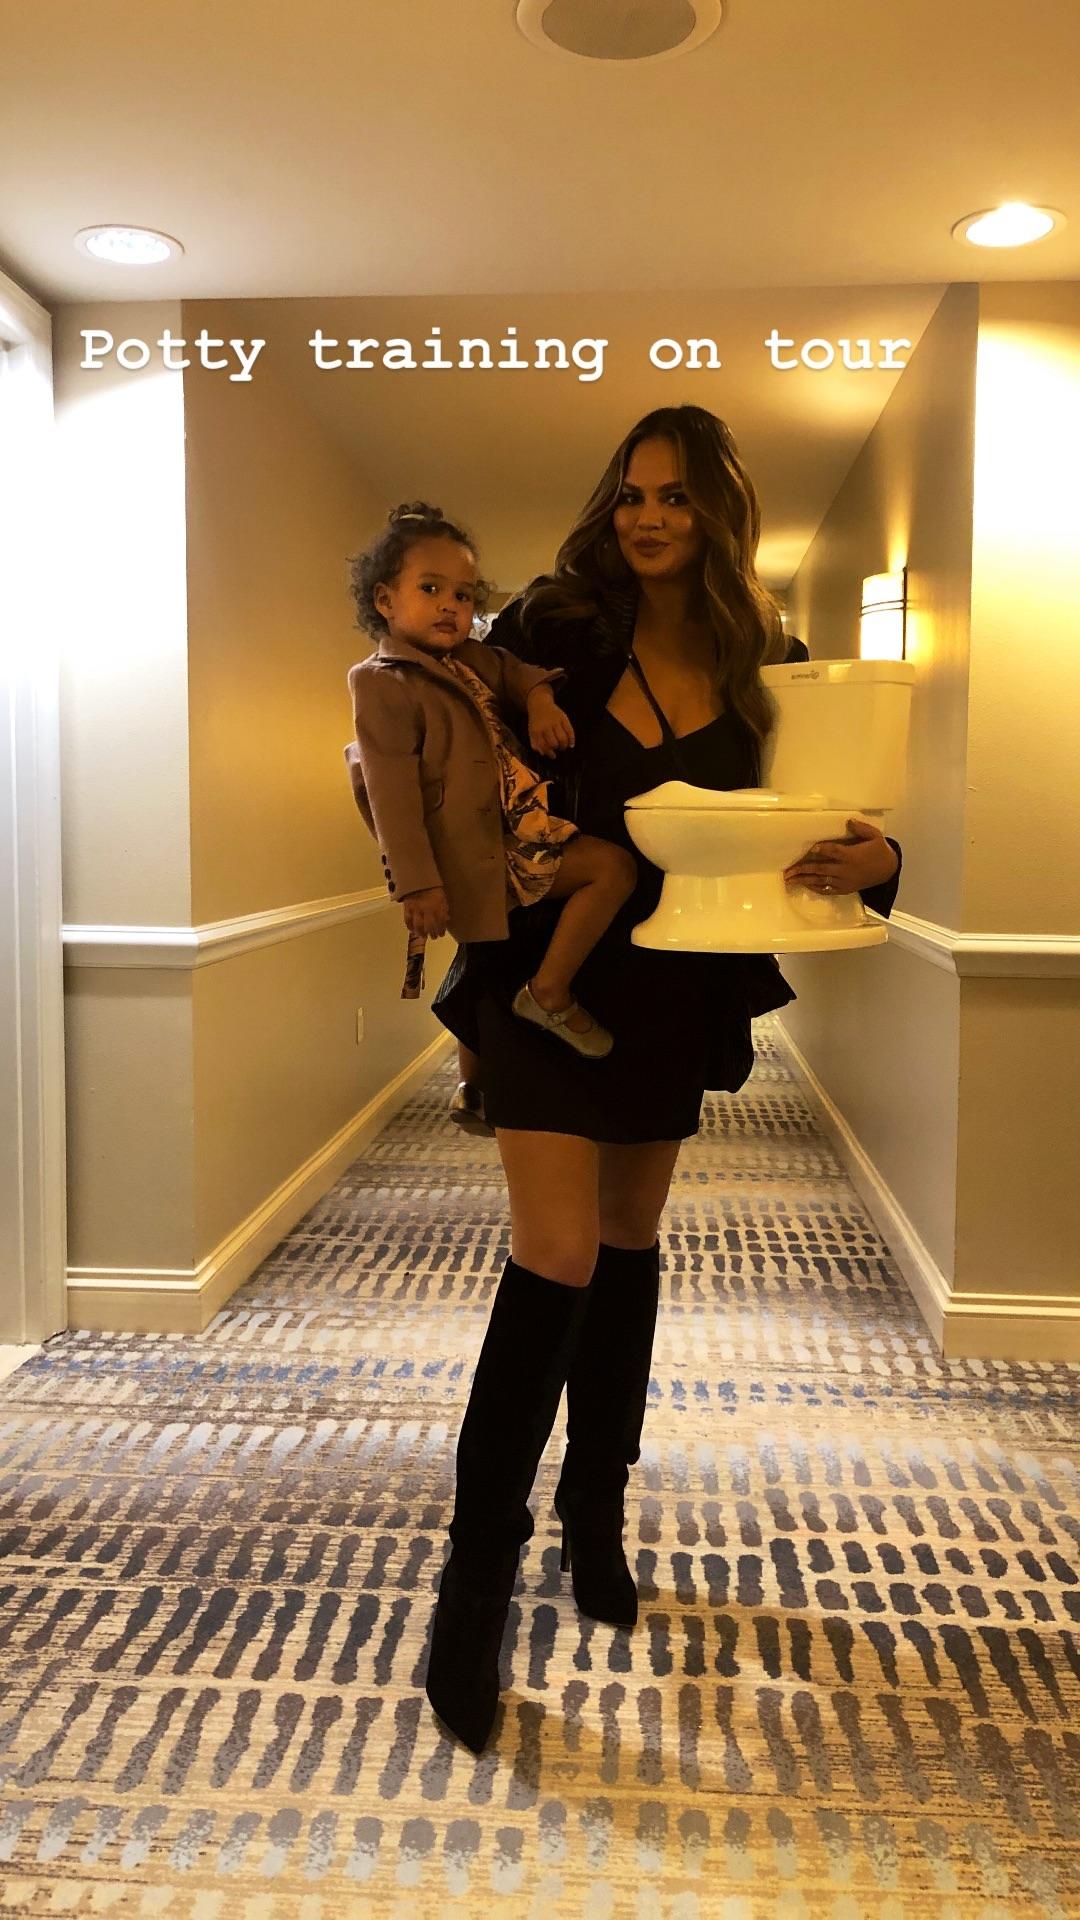 2018.11.16_Celebrity Chrissy Teigen, Instagram Stories_Summer Infant My Size Potty01.jpg